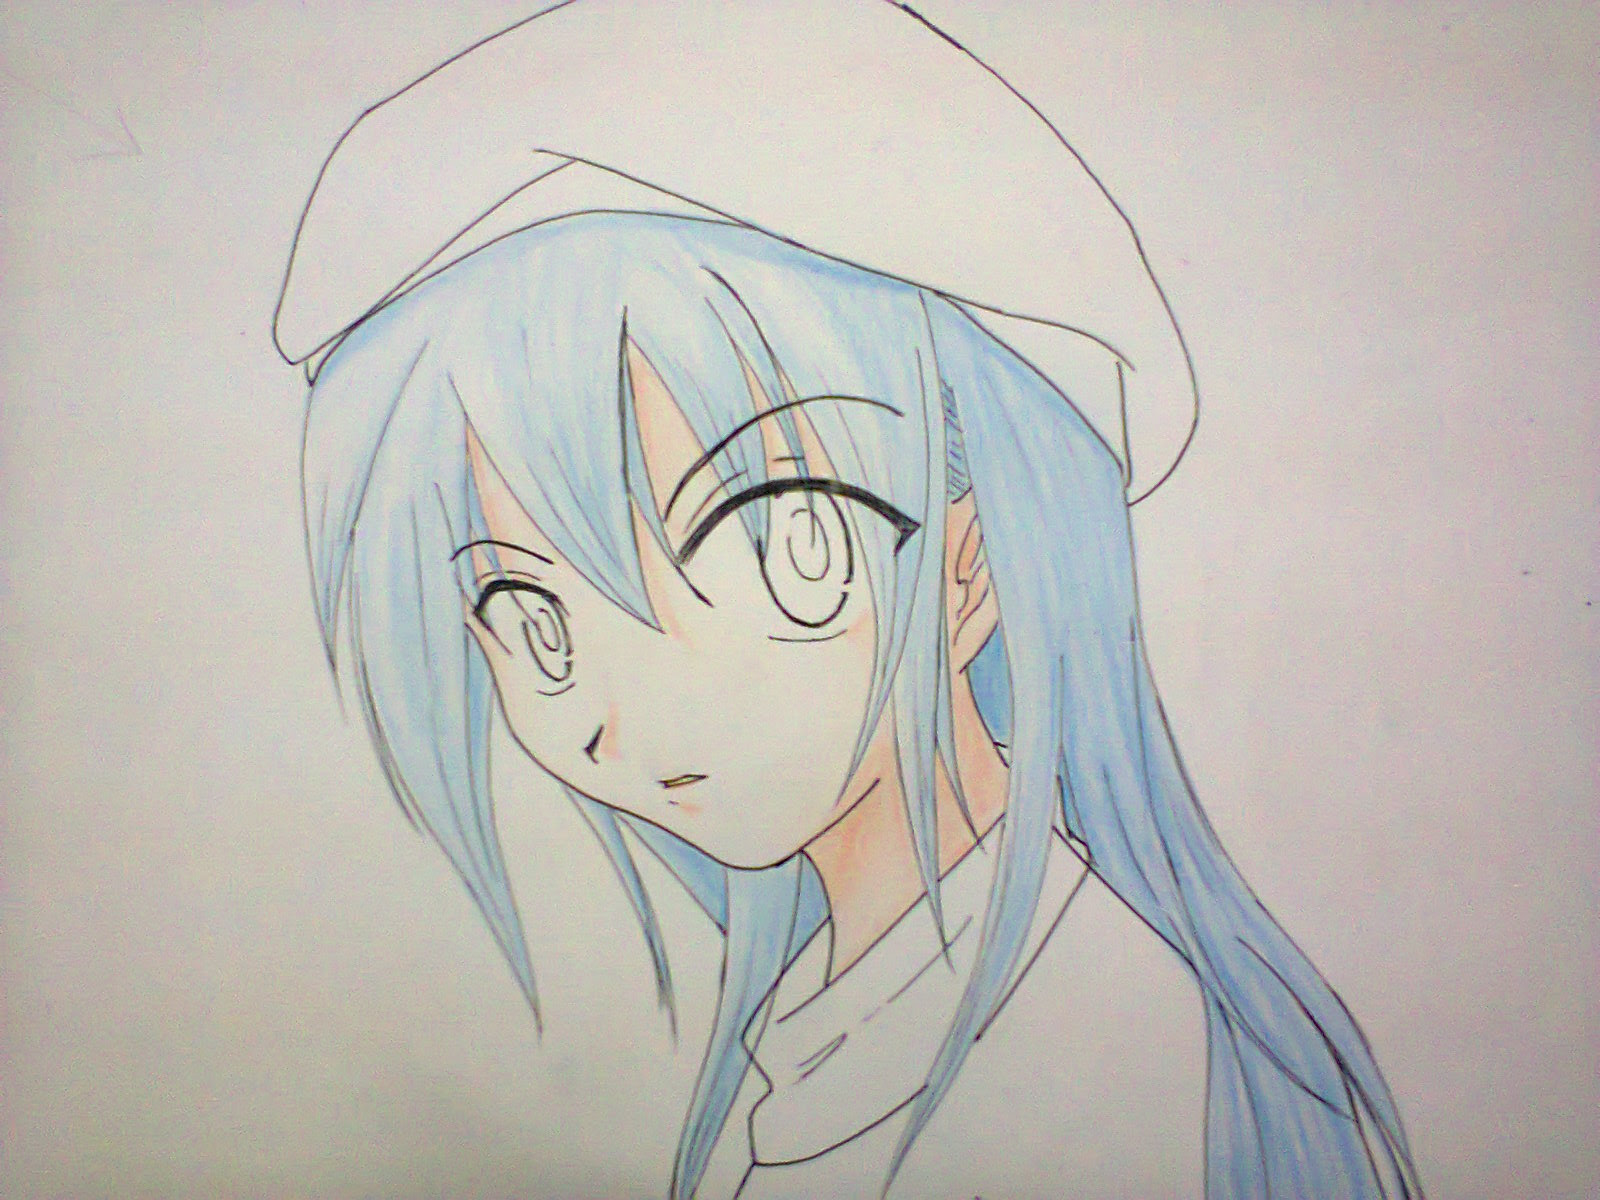 Gambar Anime Rambut Biru - Gambarrrrrrr